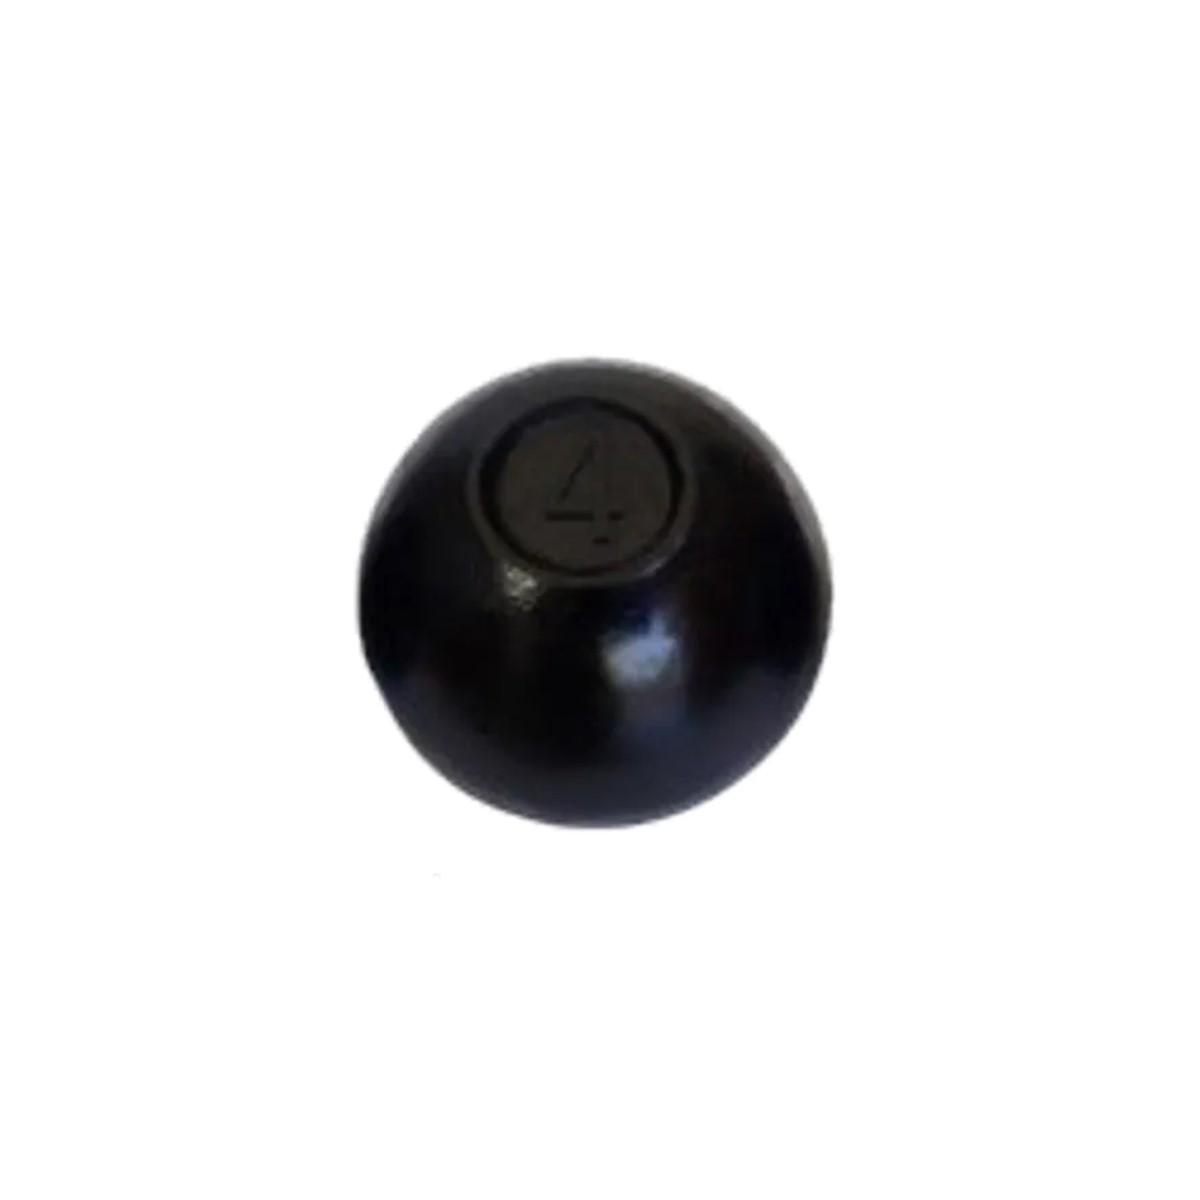 Bola de  Arremesso Ferro Fundido Treinamento Funcional 4kg  - Panela de Ferro Fundido